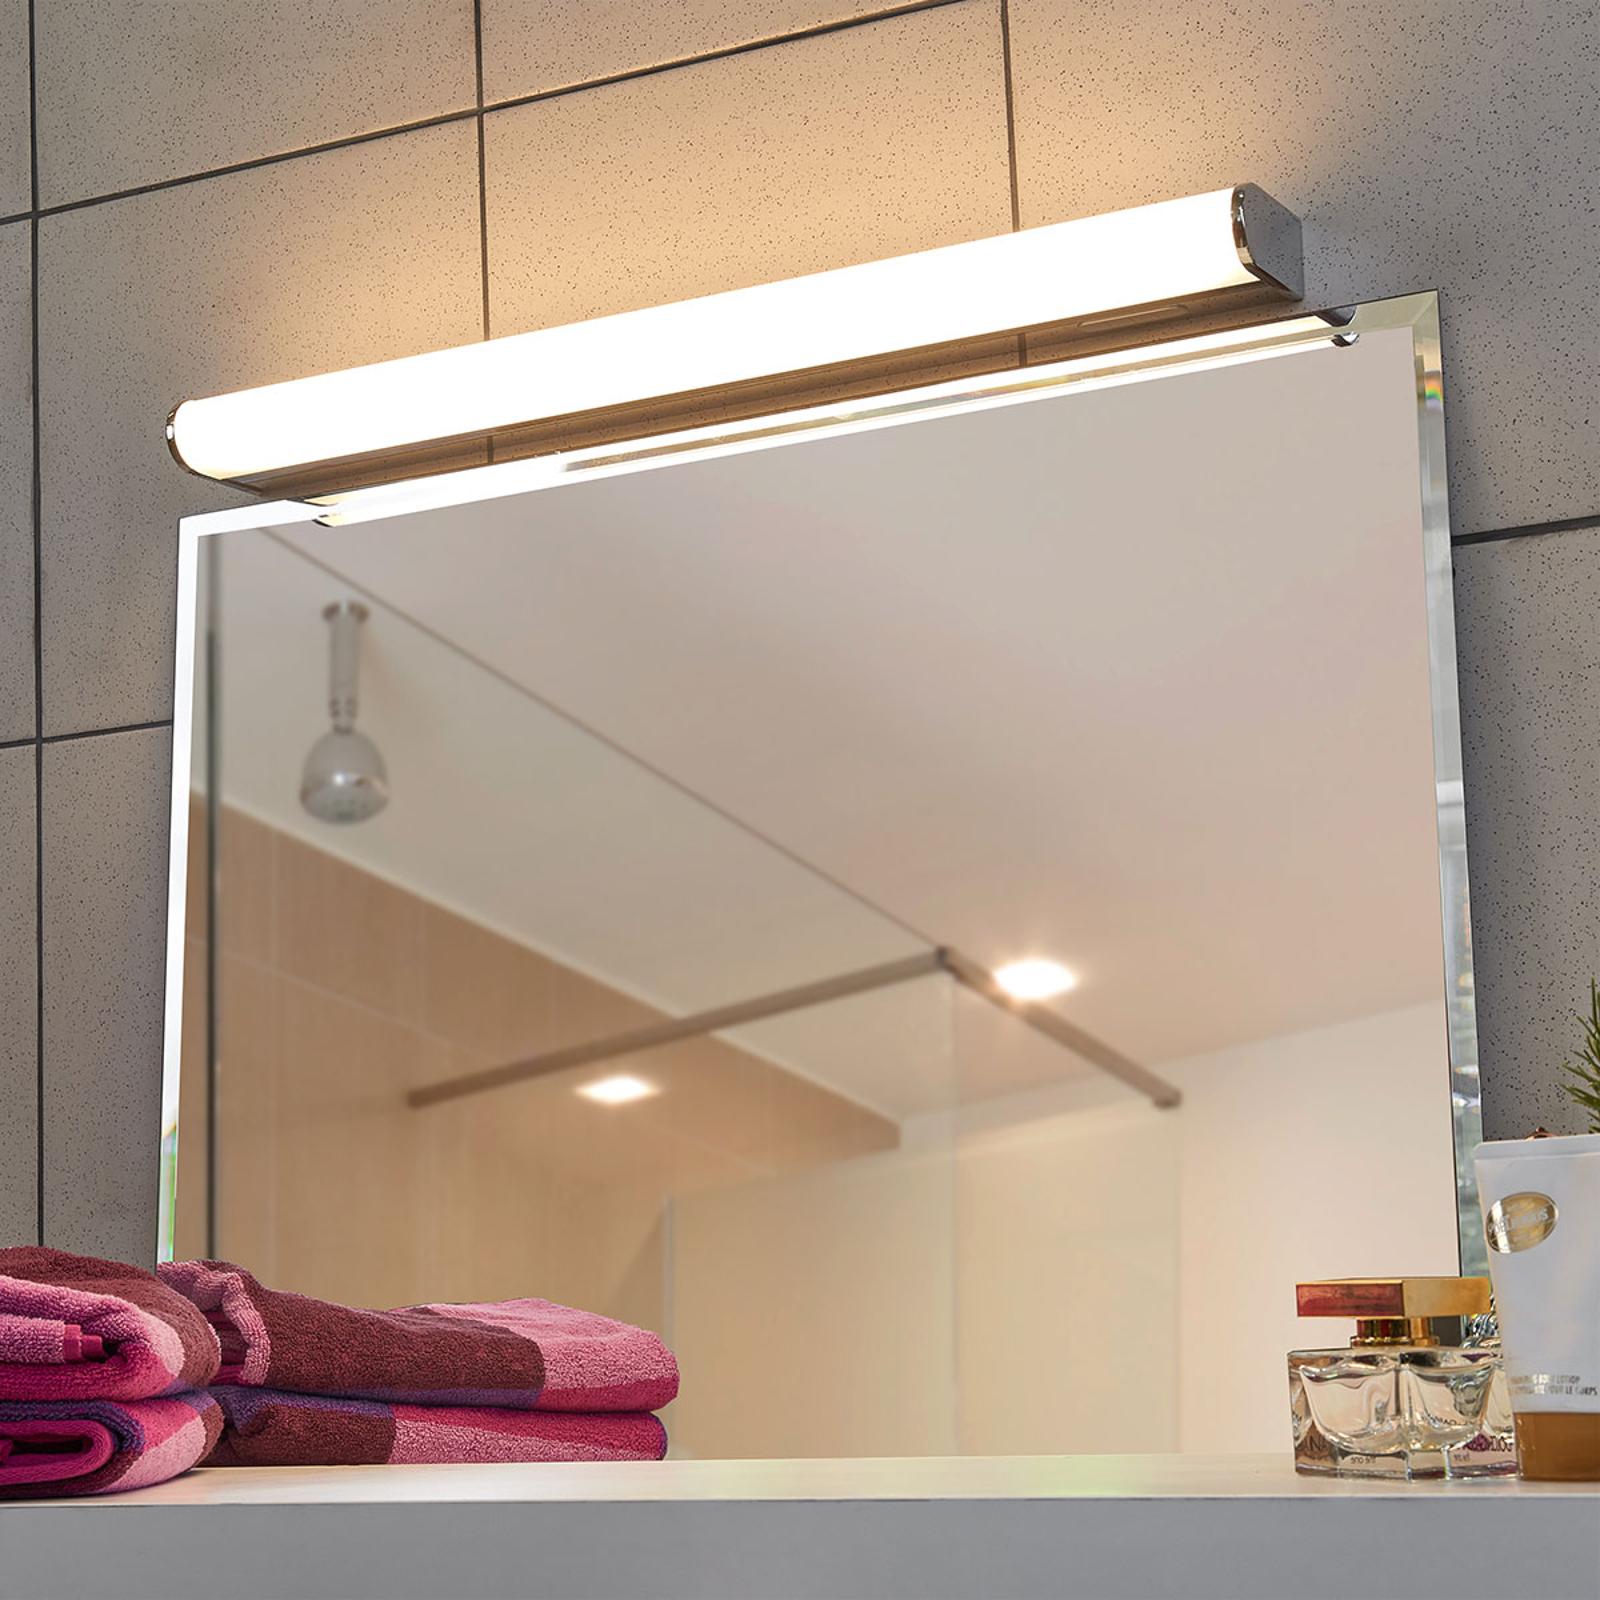 Aplique LED Jesko Bad 3.000-6.500K, 59 cm